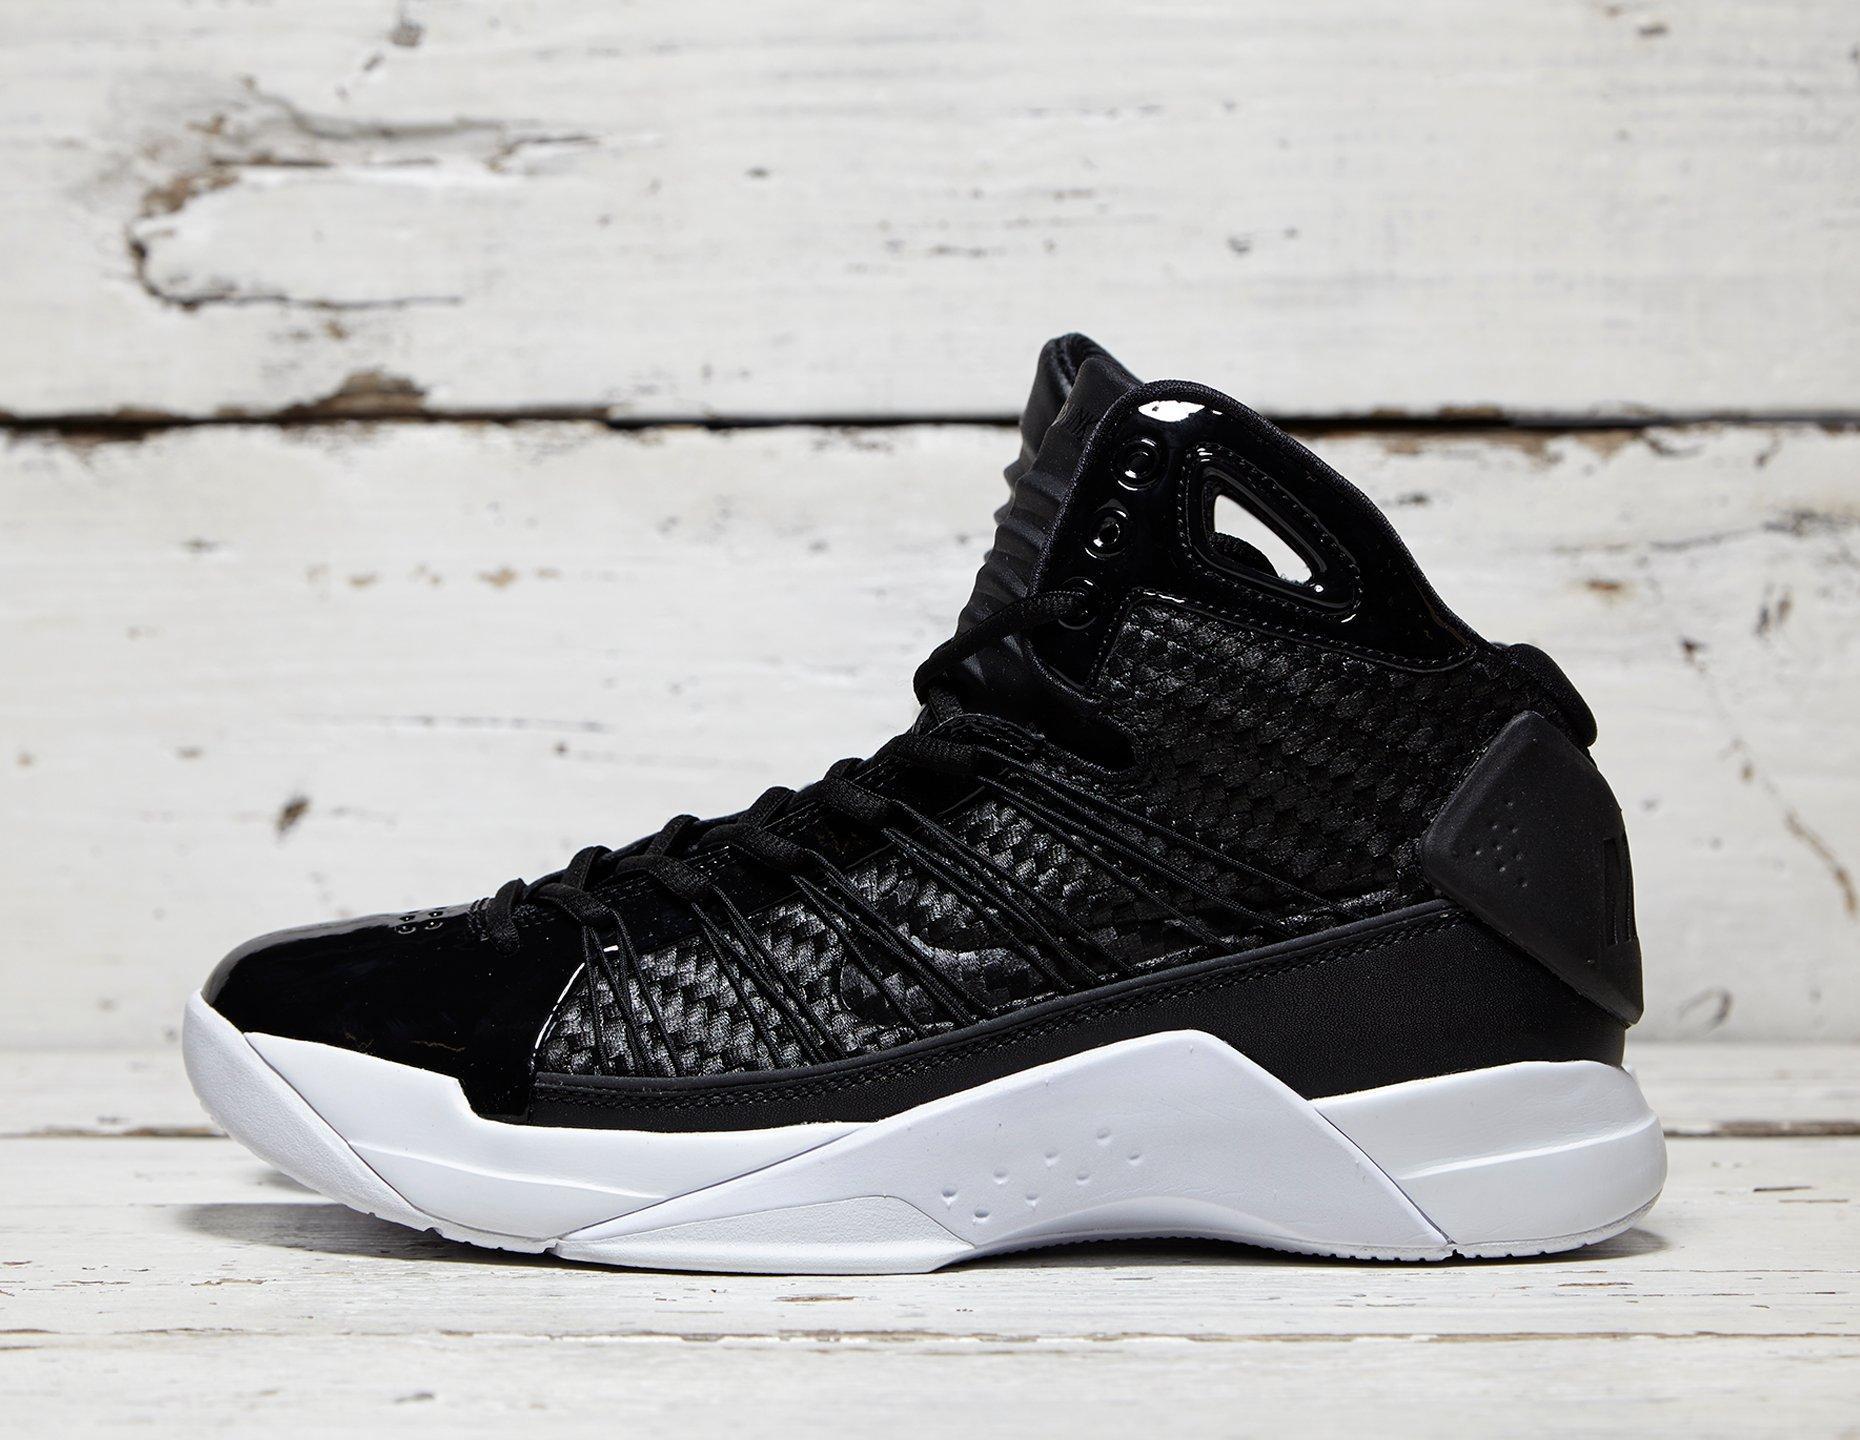 Mens Nike Hyperdunk Lux - Black, Black - photo 1/1